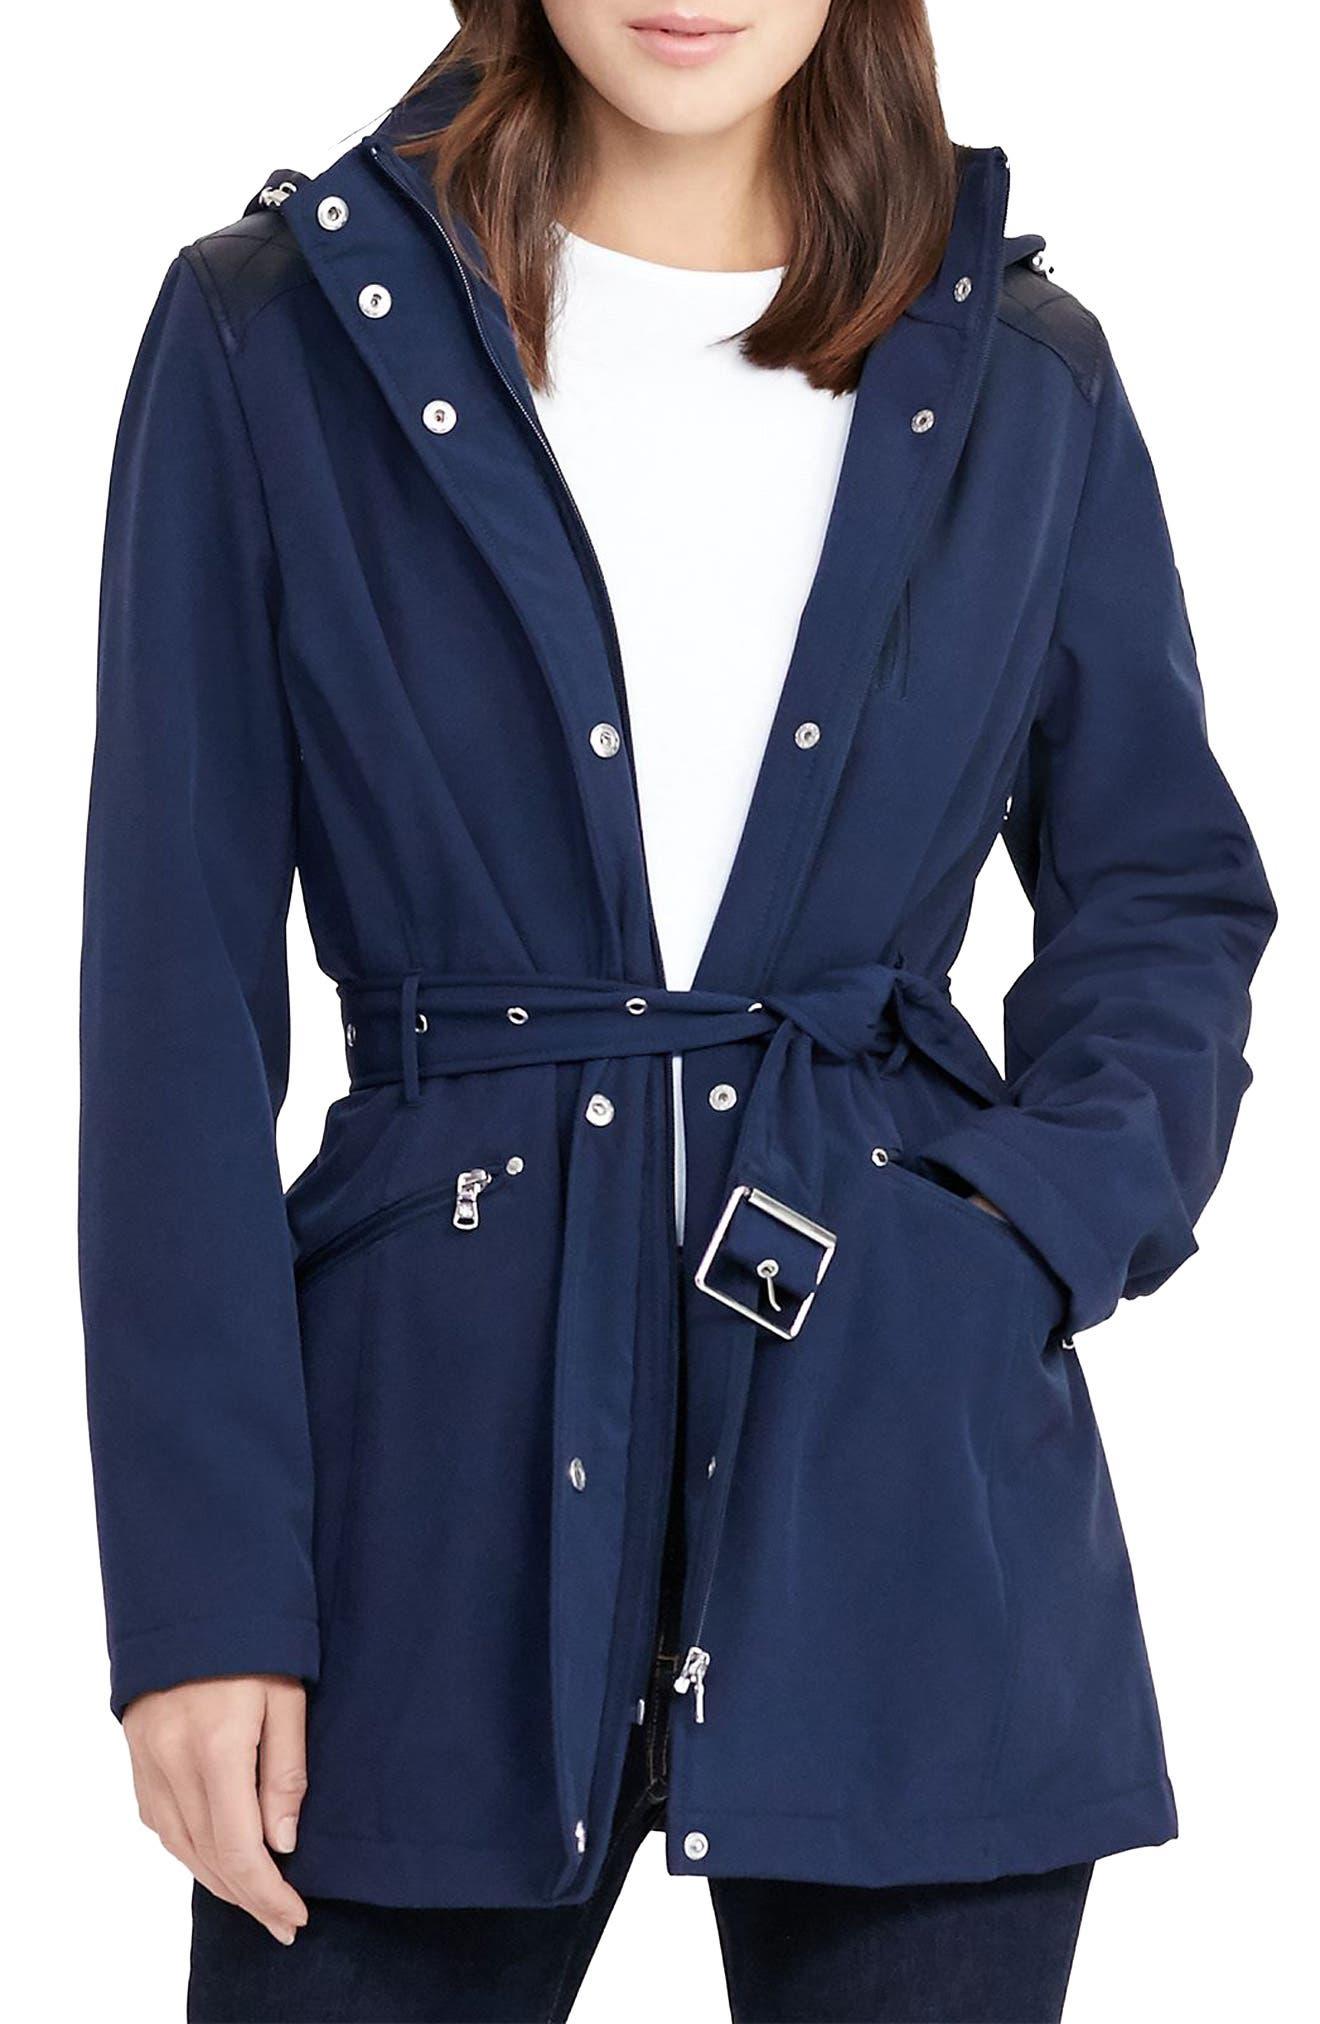 Alternate Image 1 Selected - Lauren Ralph Lauren Belted Hooded Soft Shell Jacket